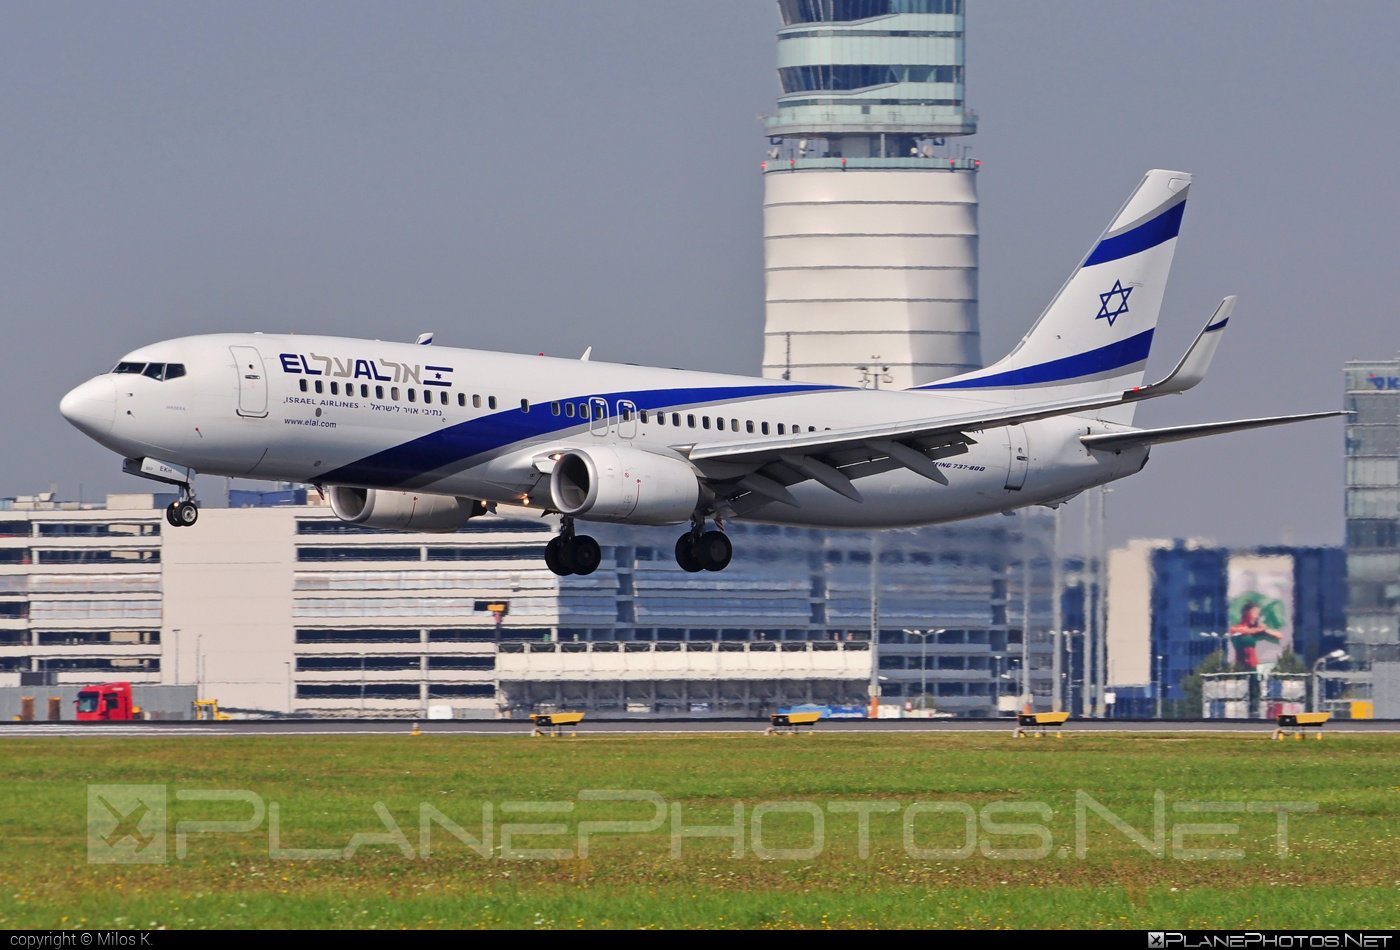 Boeing 737-800 - 4X-EKH operated by El Al Israel Airlines #b737 #b737nextgen #b737ng #boeing #boeing737 #elal #elalisraelairlines #israelairlines